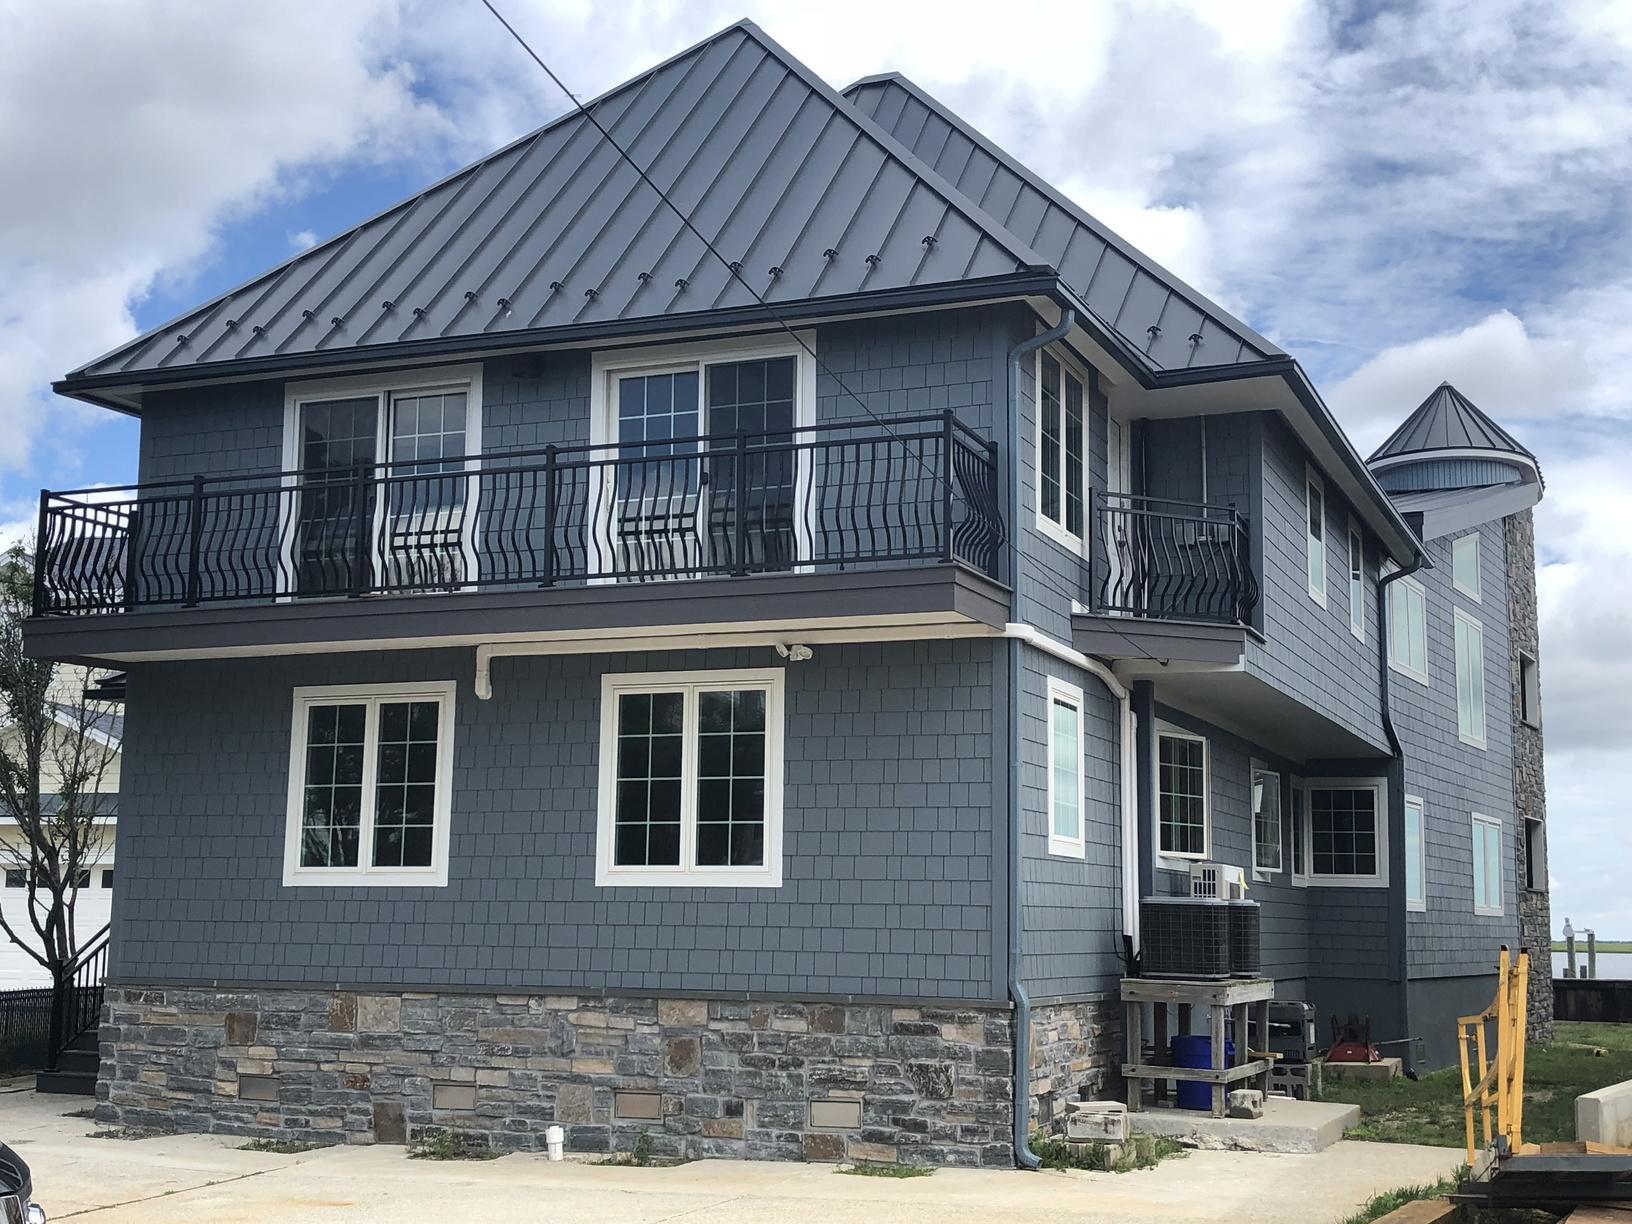 Fiber Cement and Stone Siding, Fiberglass Windows, and Standing Seam Metal Roof Installation in Brigantine, NJ